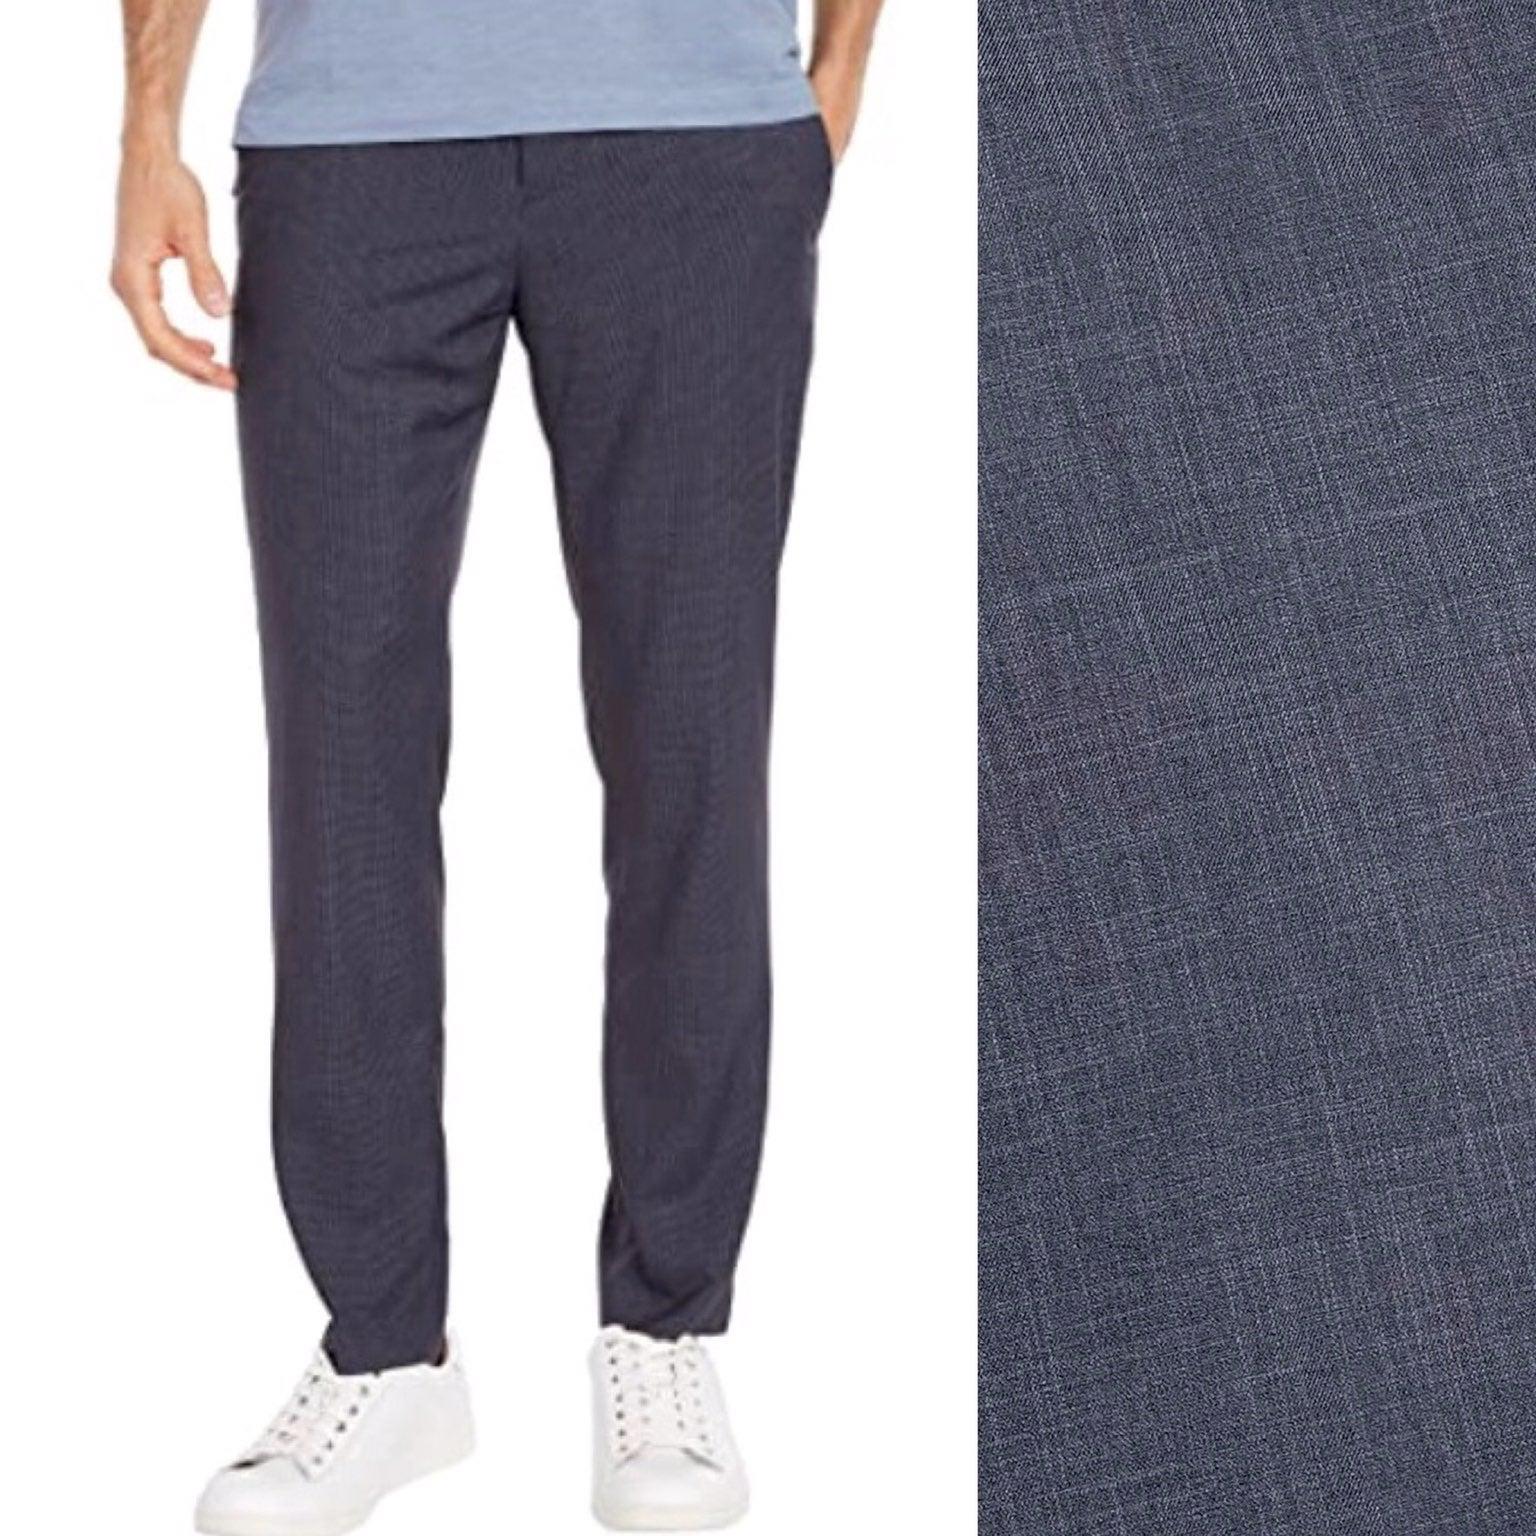 NEW Perry Ellis Slim Fit Dress Pants